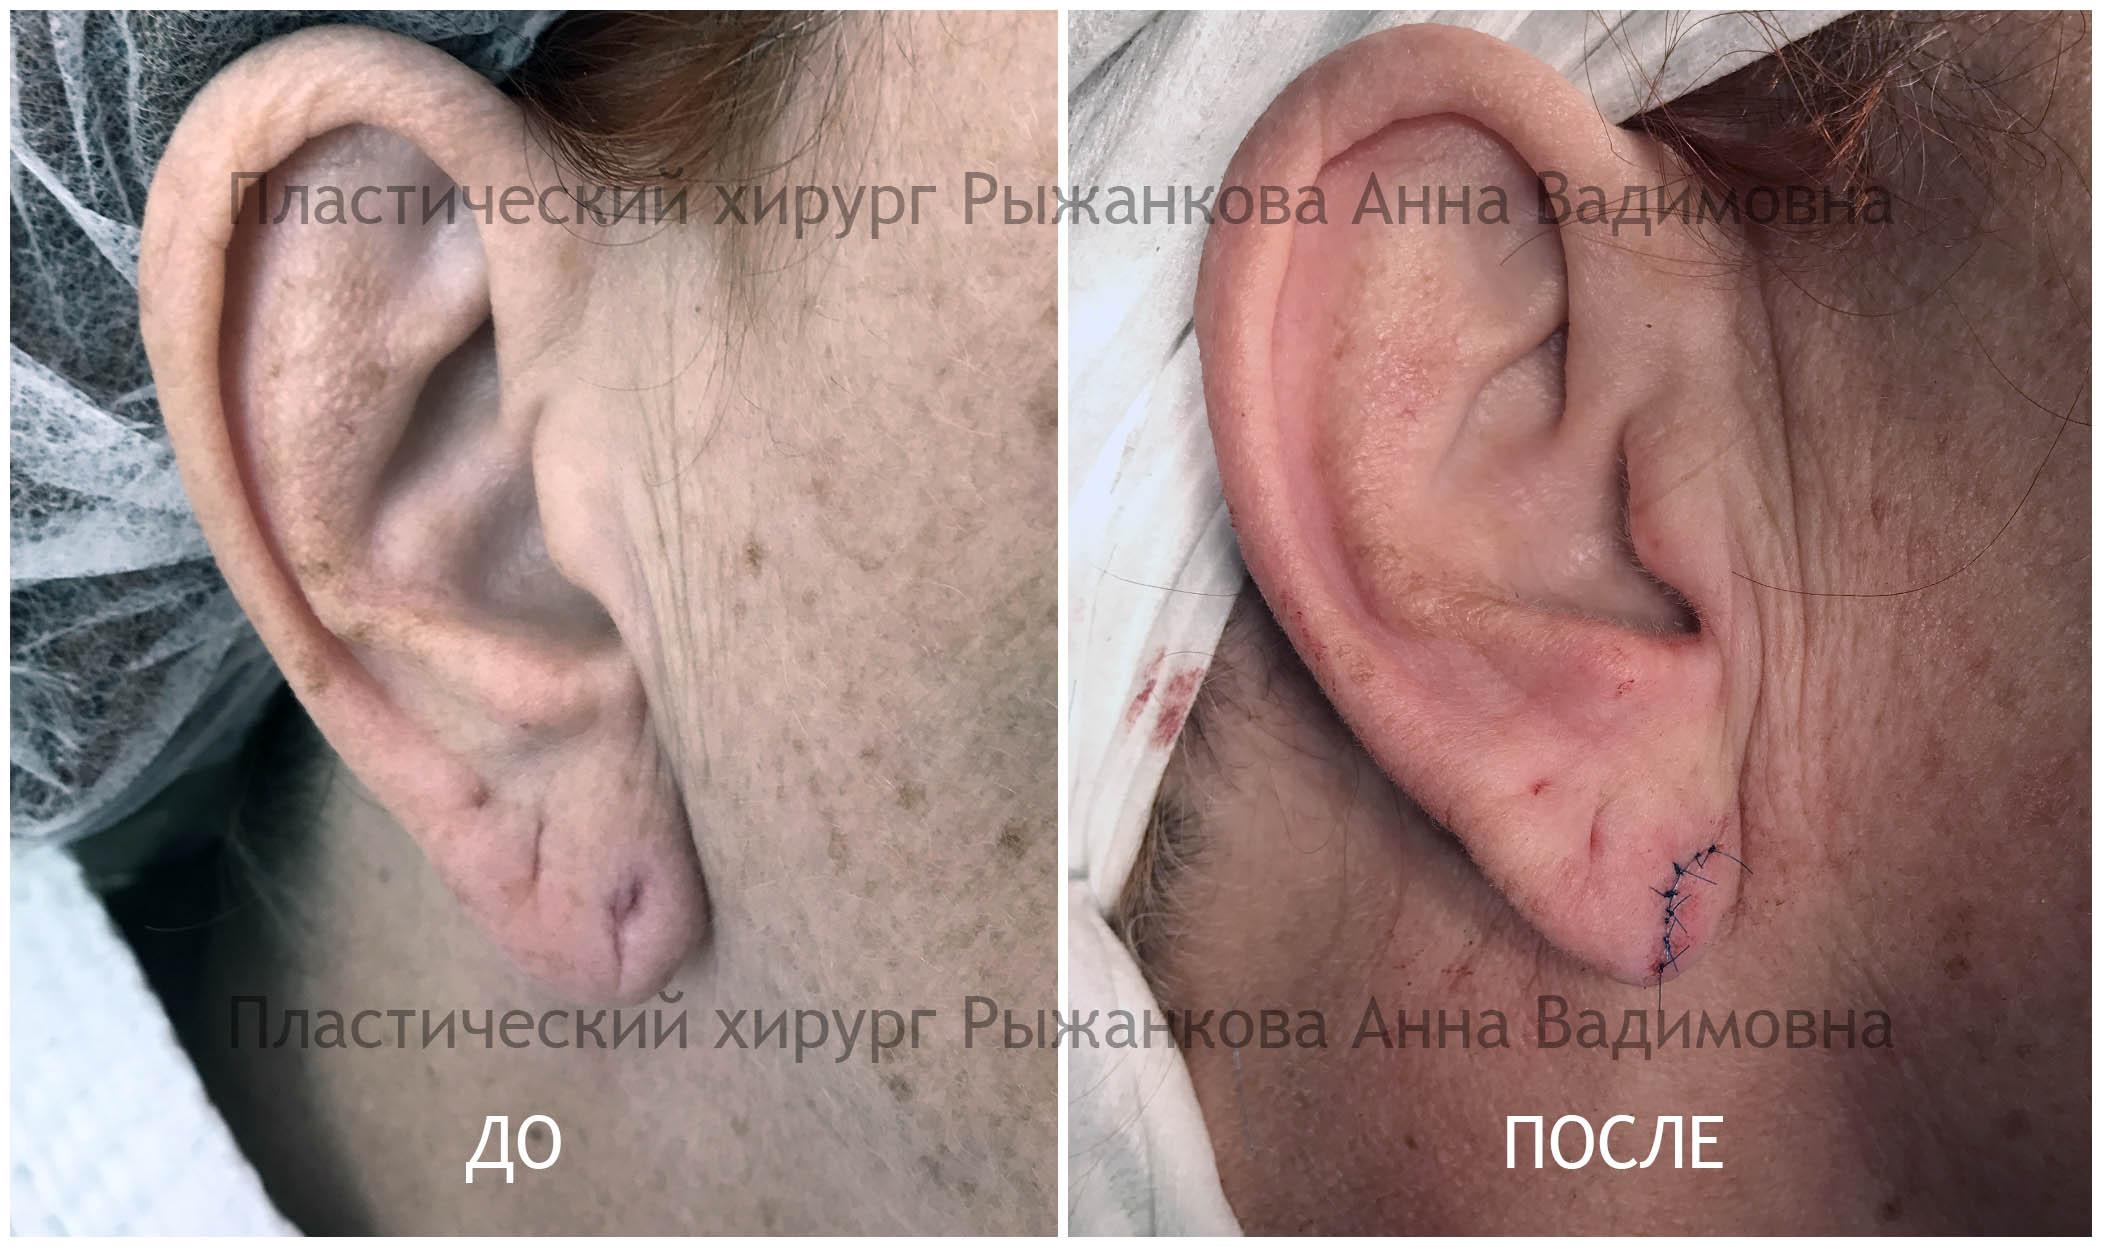 Коррекция мочки Фото До и После